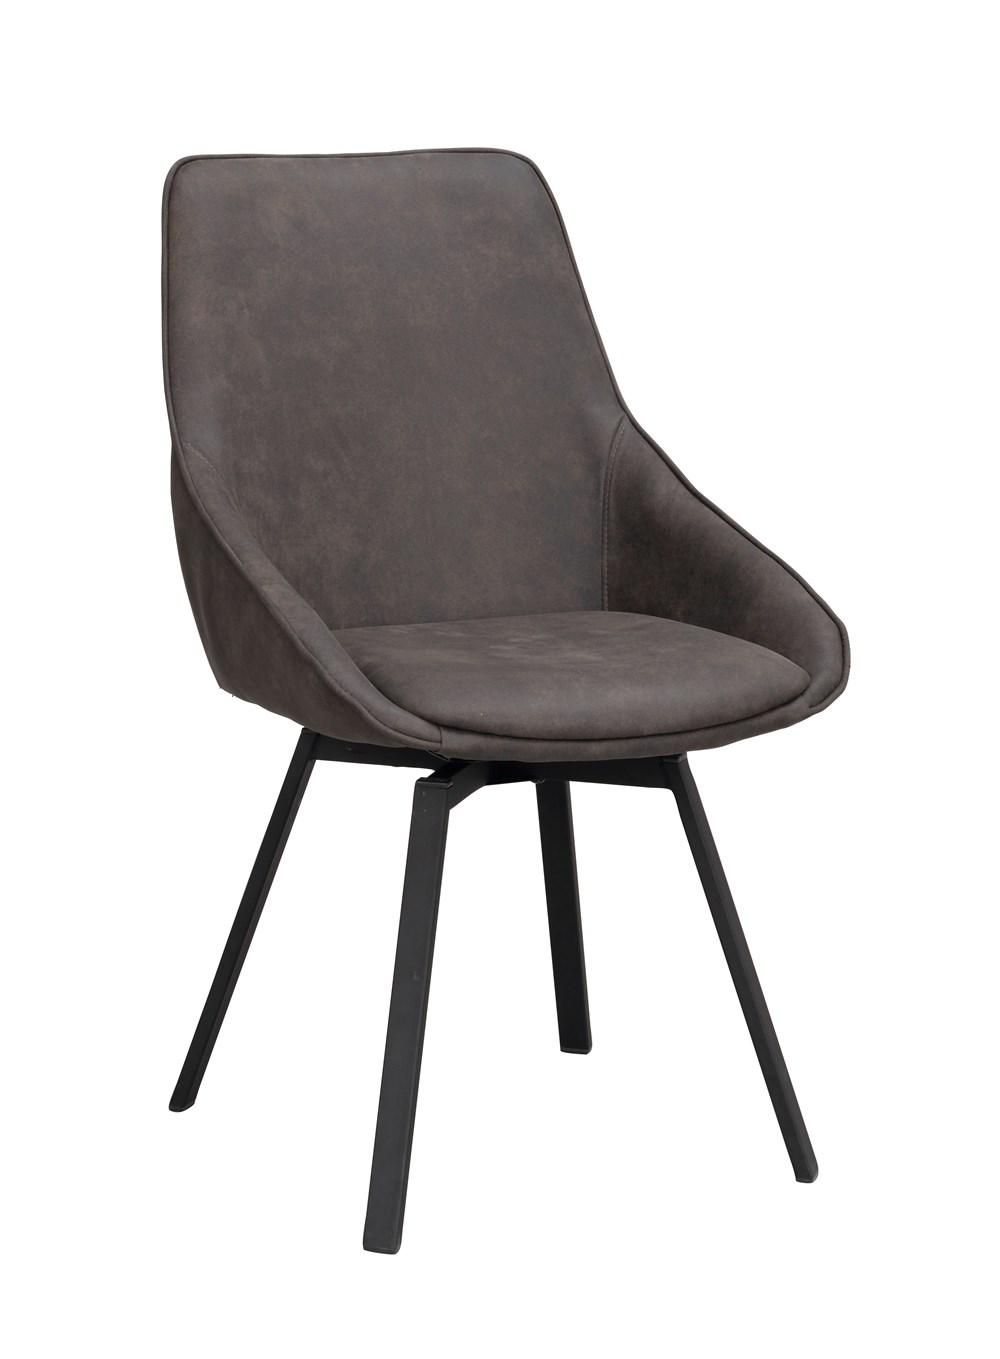 Alison tuoli tummanharmaa/musta, Rowico